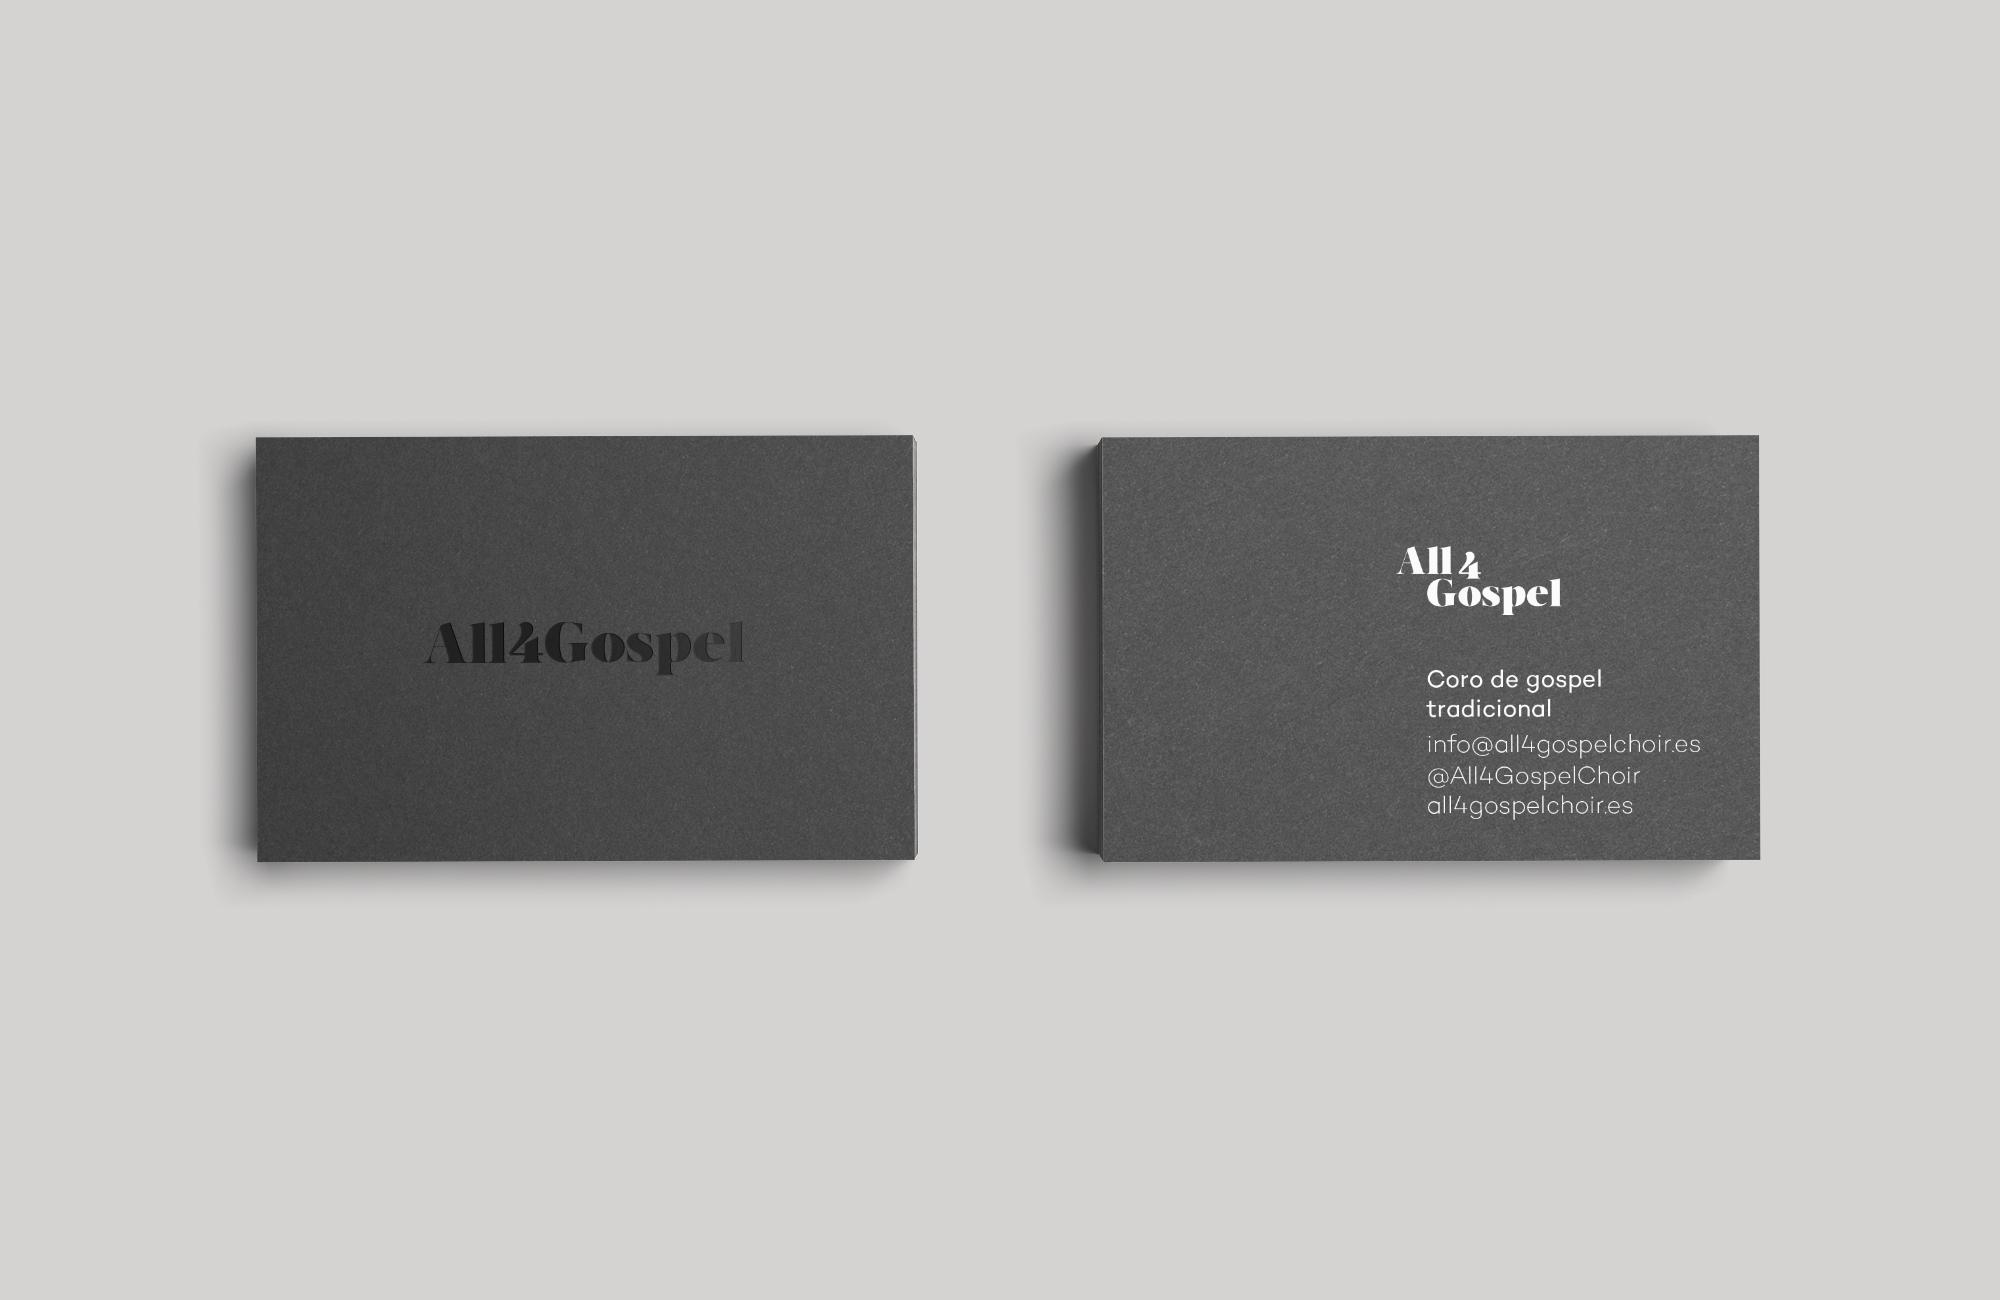 all4gospel_cards-yes